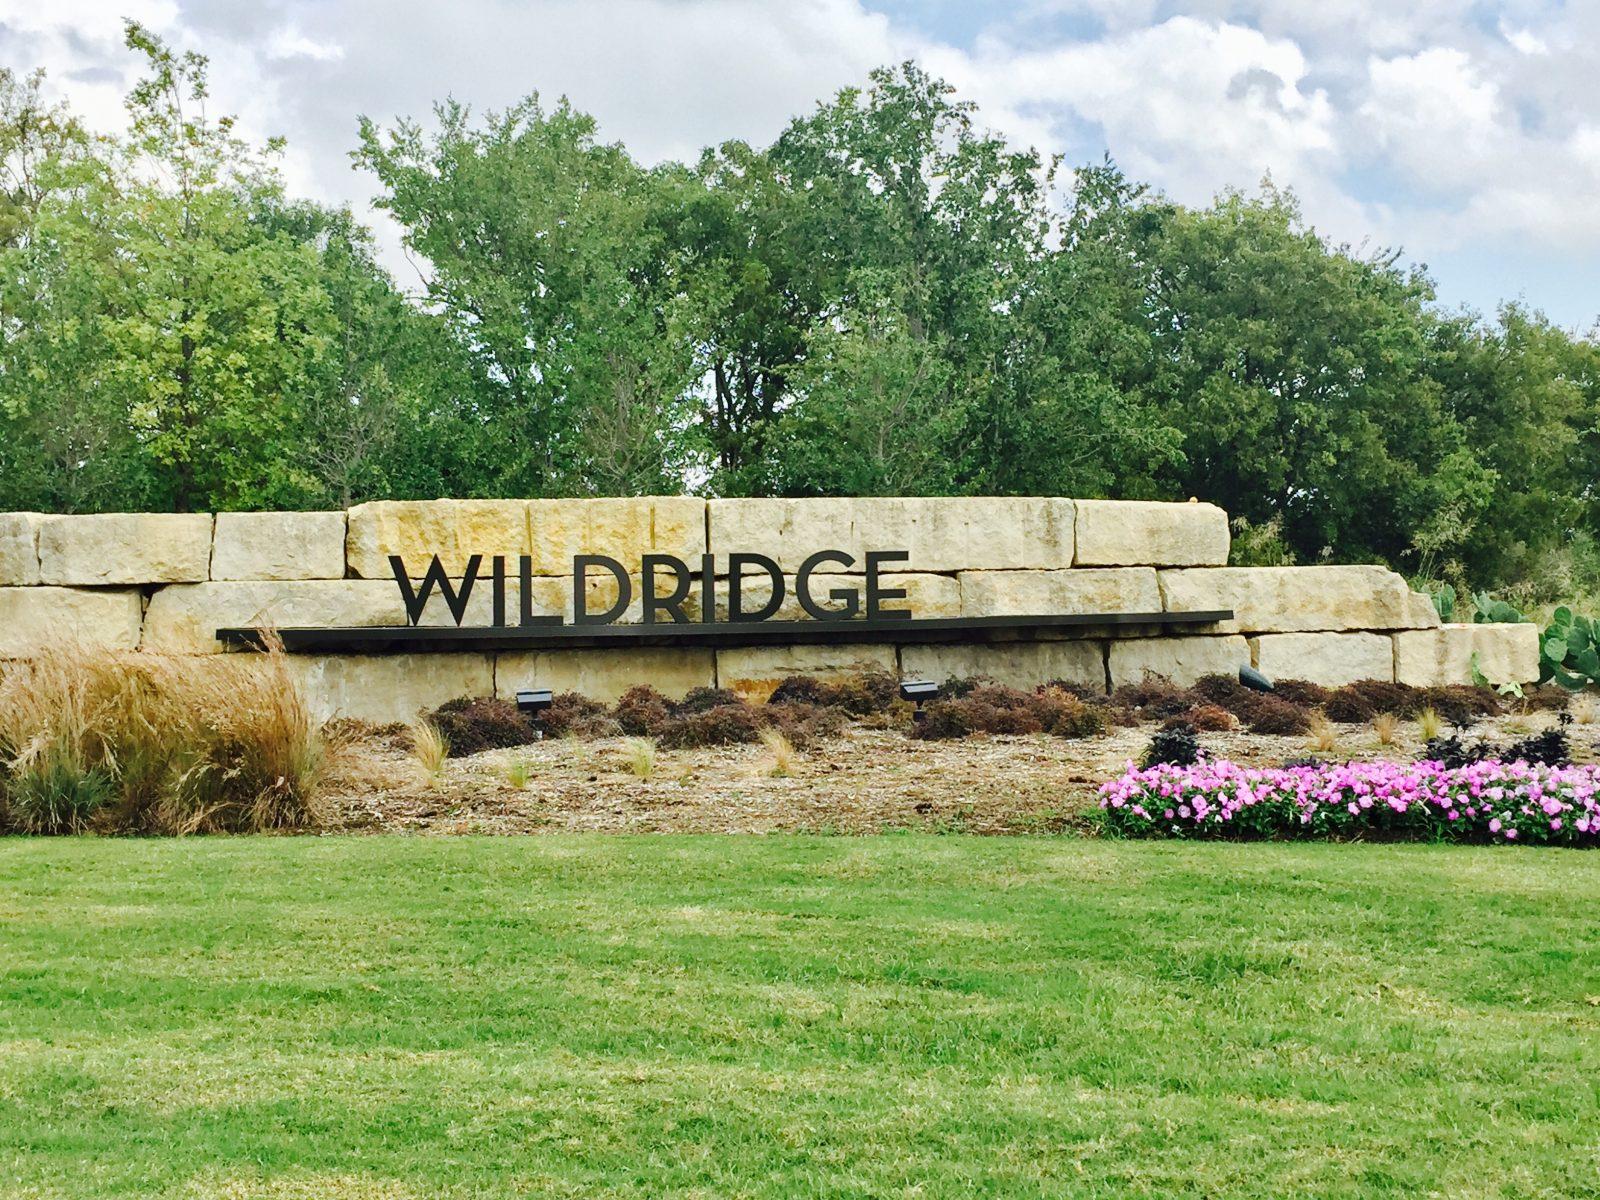 Wildridge-OakPoint-entrance-sign-1